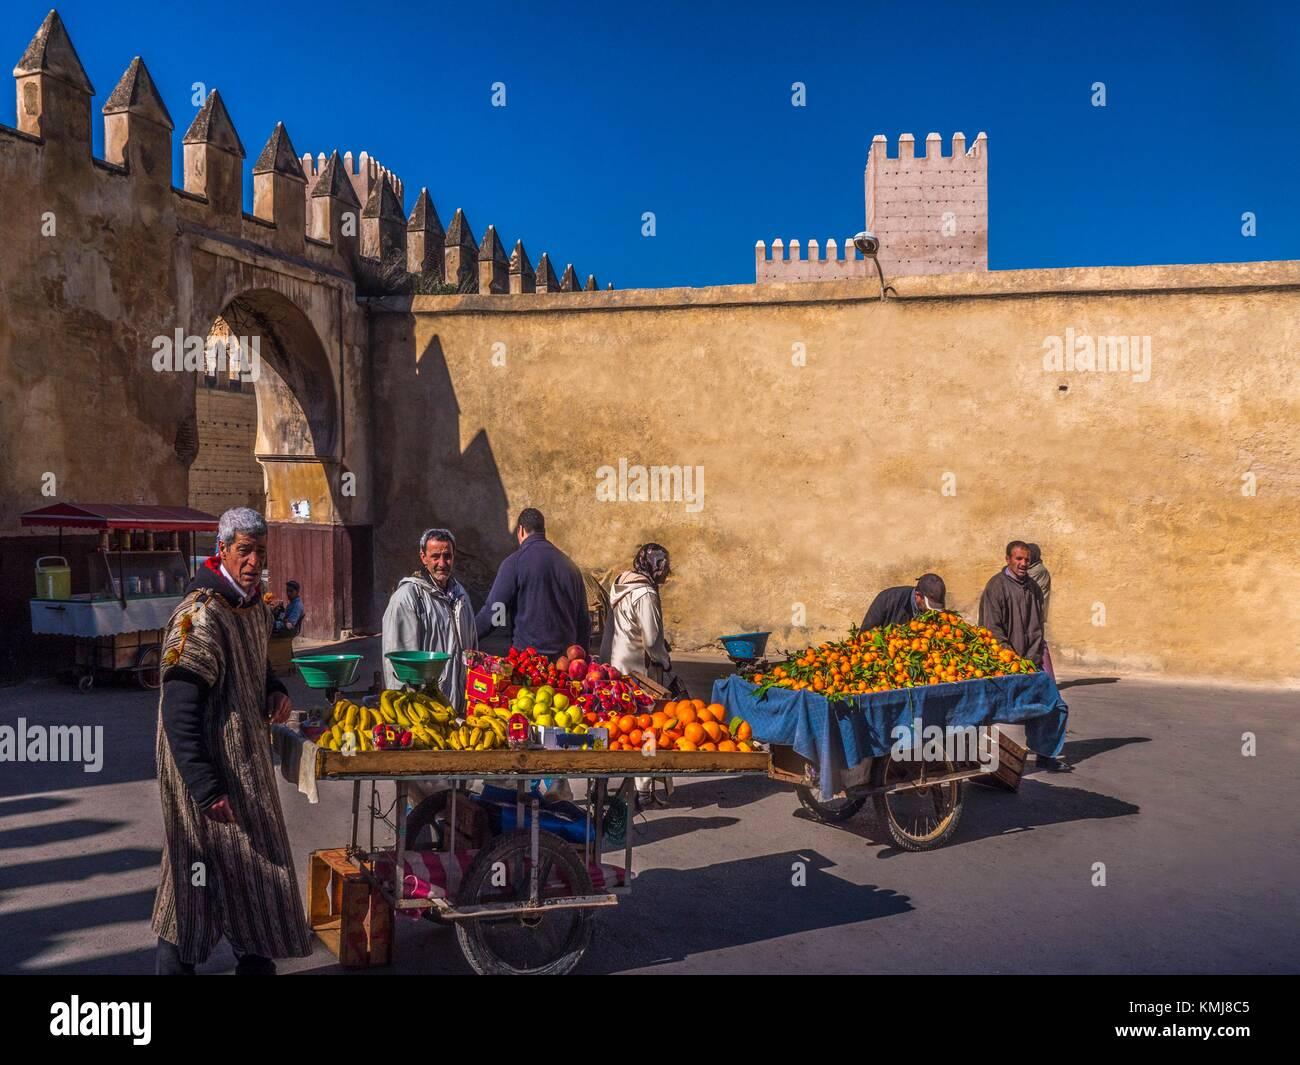 Morrocco, Fes, Bab Dekkaken gate at Fes, Jdid - Stock Image